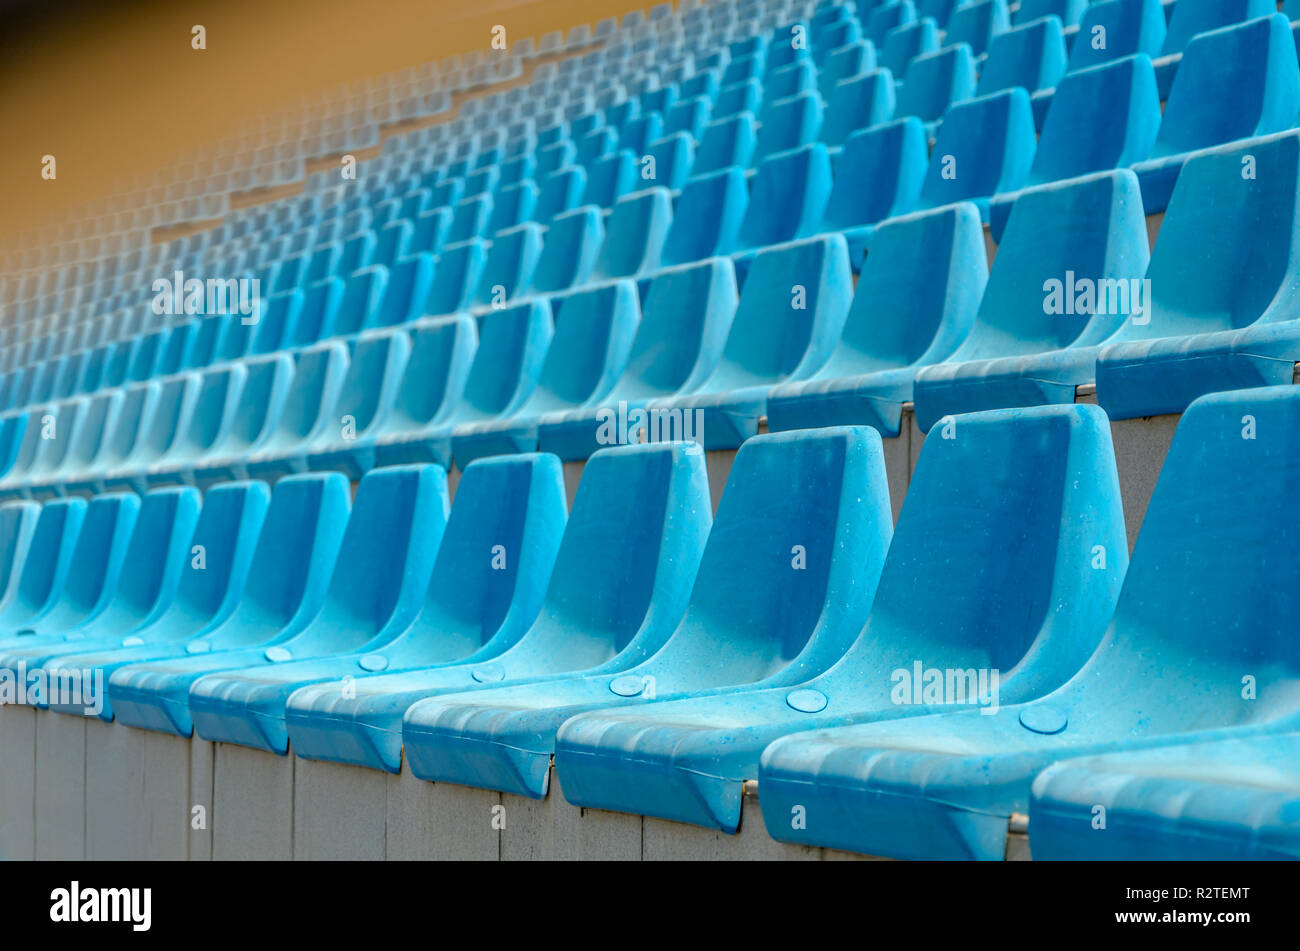 Empty blue stadium seats, - Stock Image